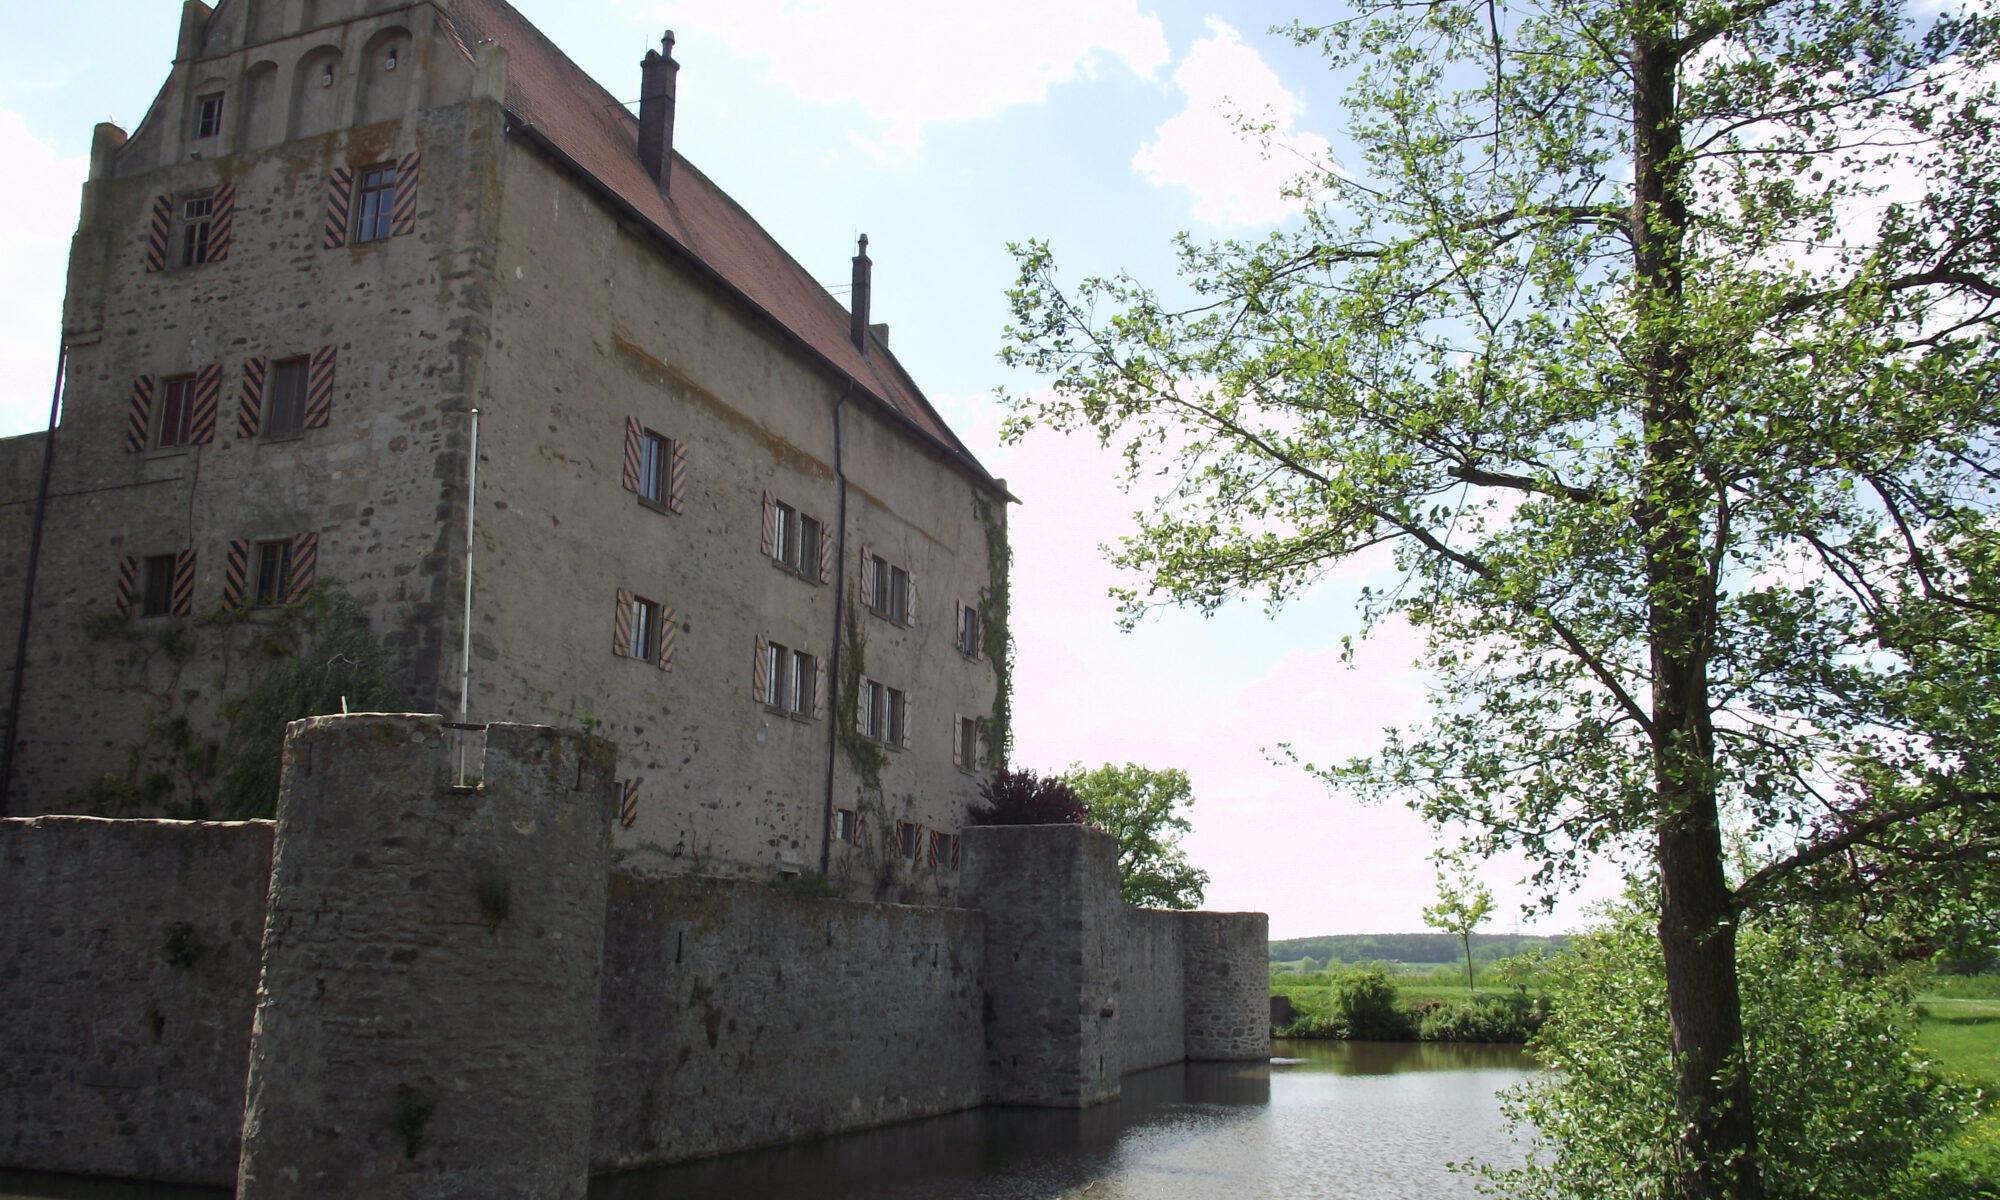 Sommersdorf - Kulturausflug, Ansbach - Sommersdorf, Wasserschloss Sommerdorf